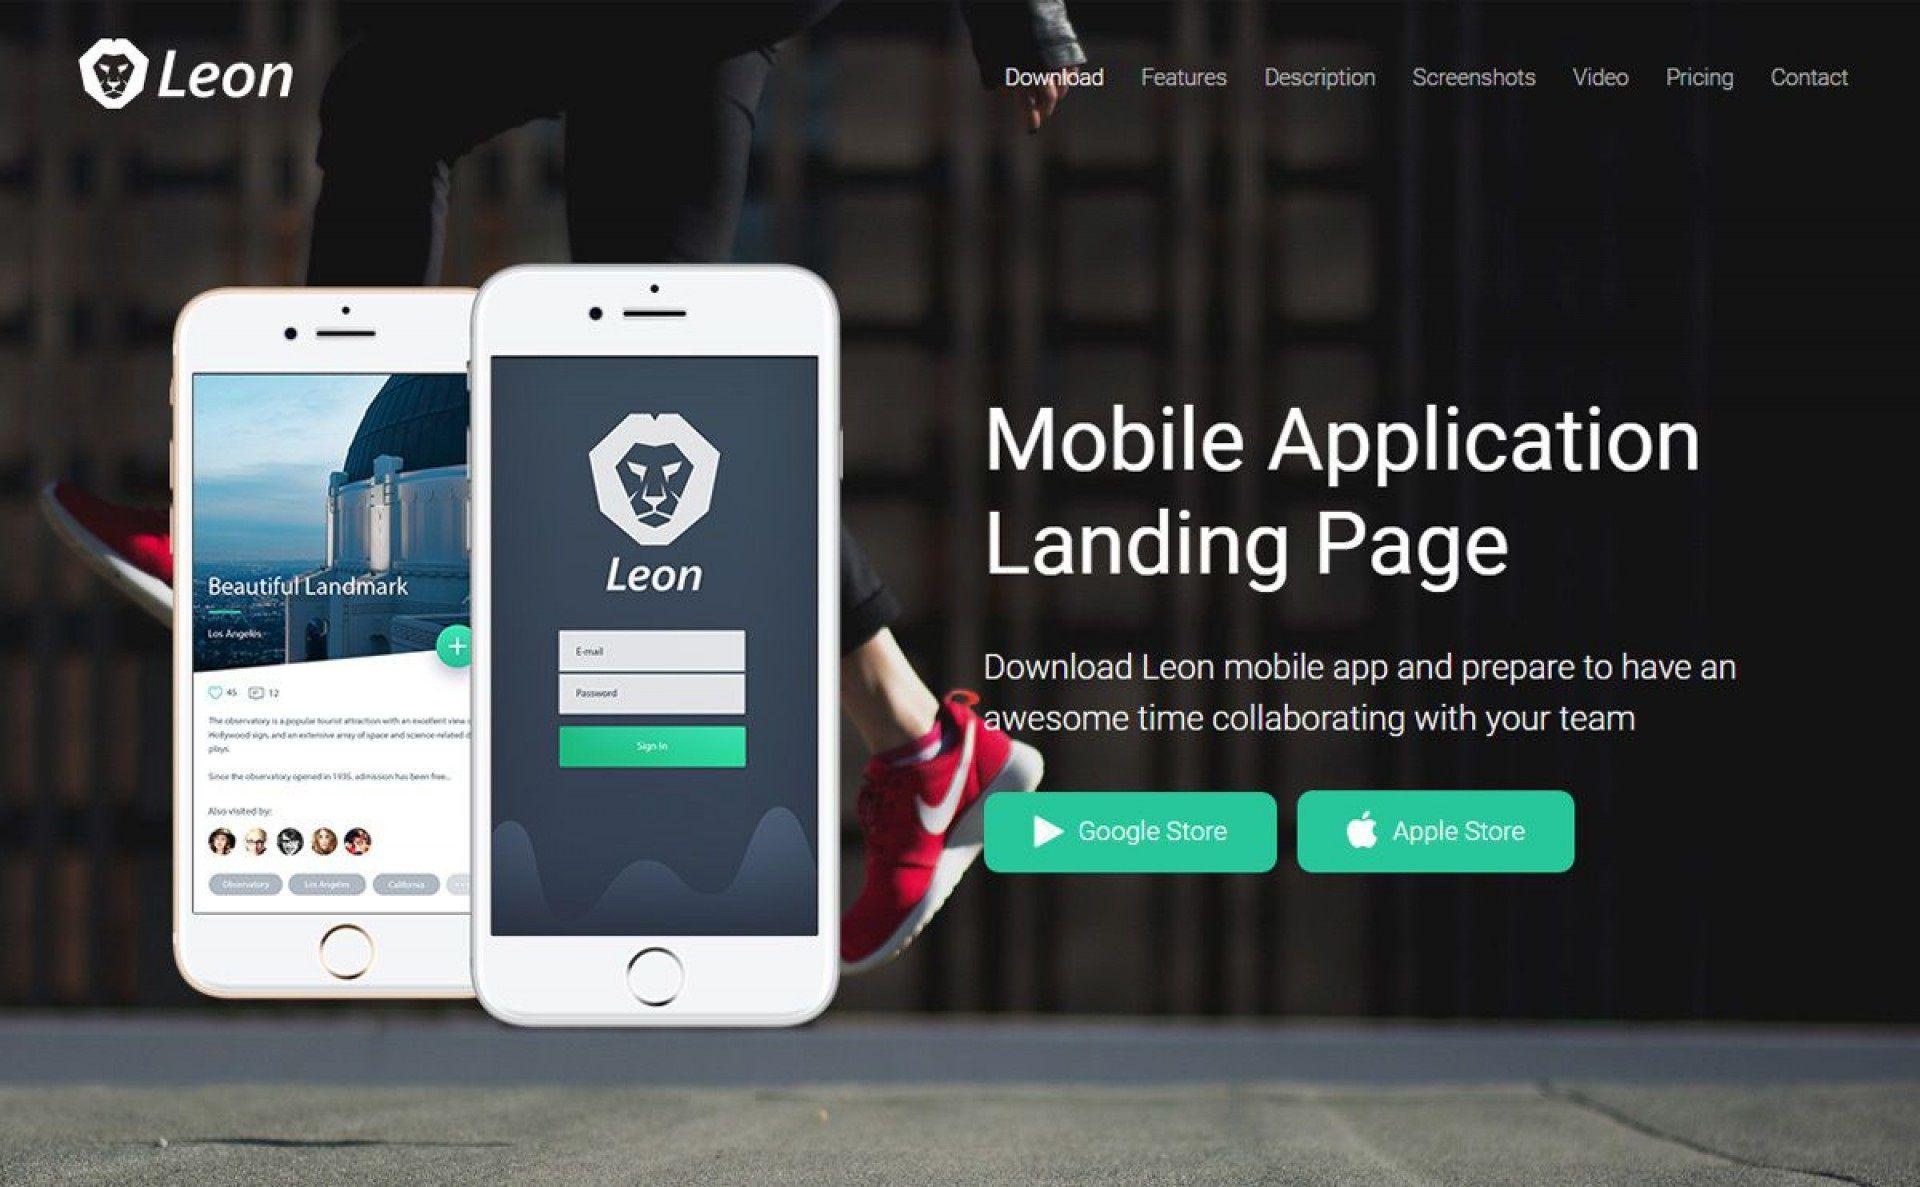 003 Frightening Csvape Esponsive Mobile App Landing Page Html Template Free Download Image  Csvape-responsive-mobile-app-landing-page-html-templateFull